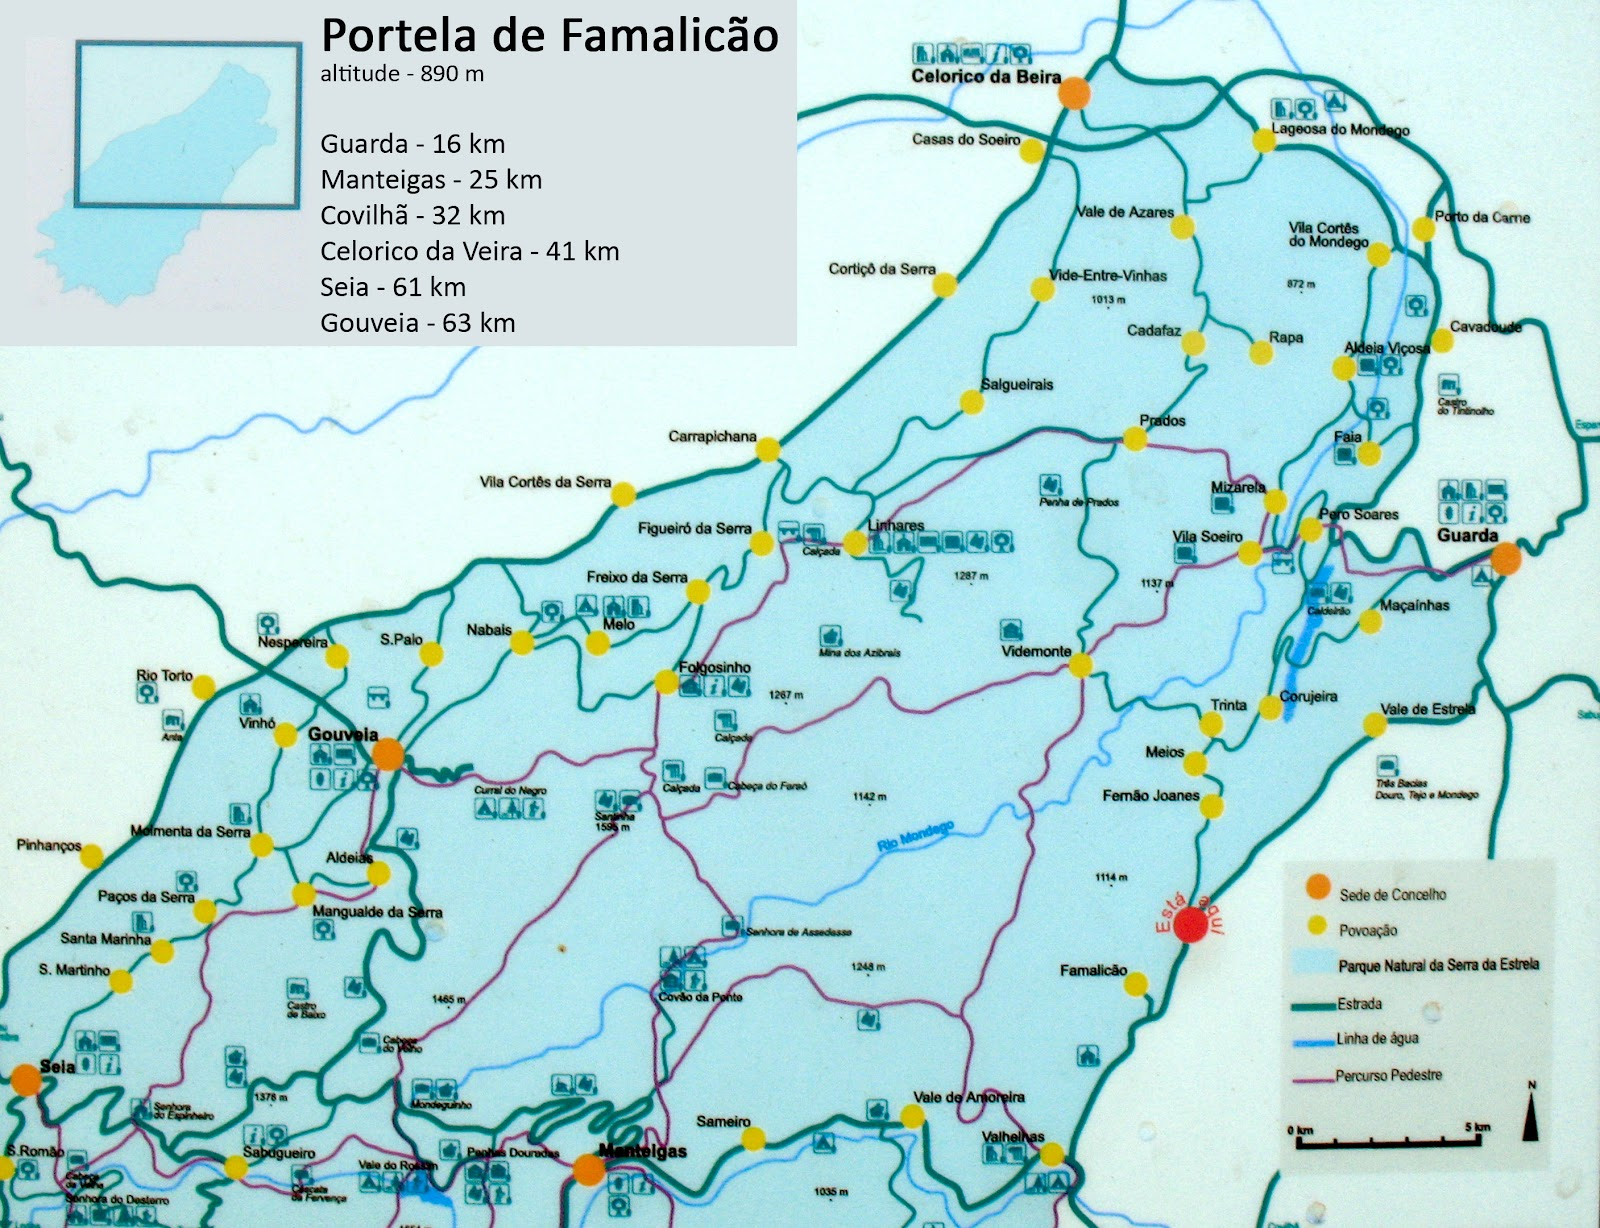 mapa turístico do parque natural da serra da estrela Mapa Turistico Serra Da Estrela | thujamassages mapa turístico do parque natural da serra da estrela